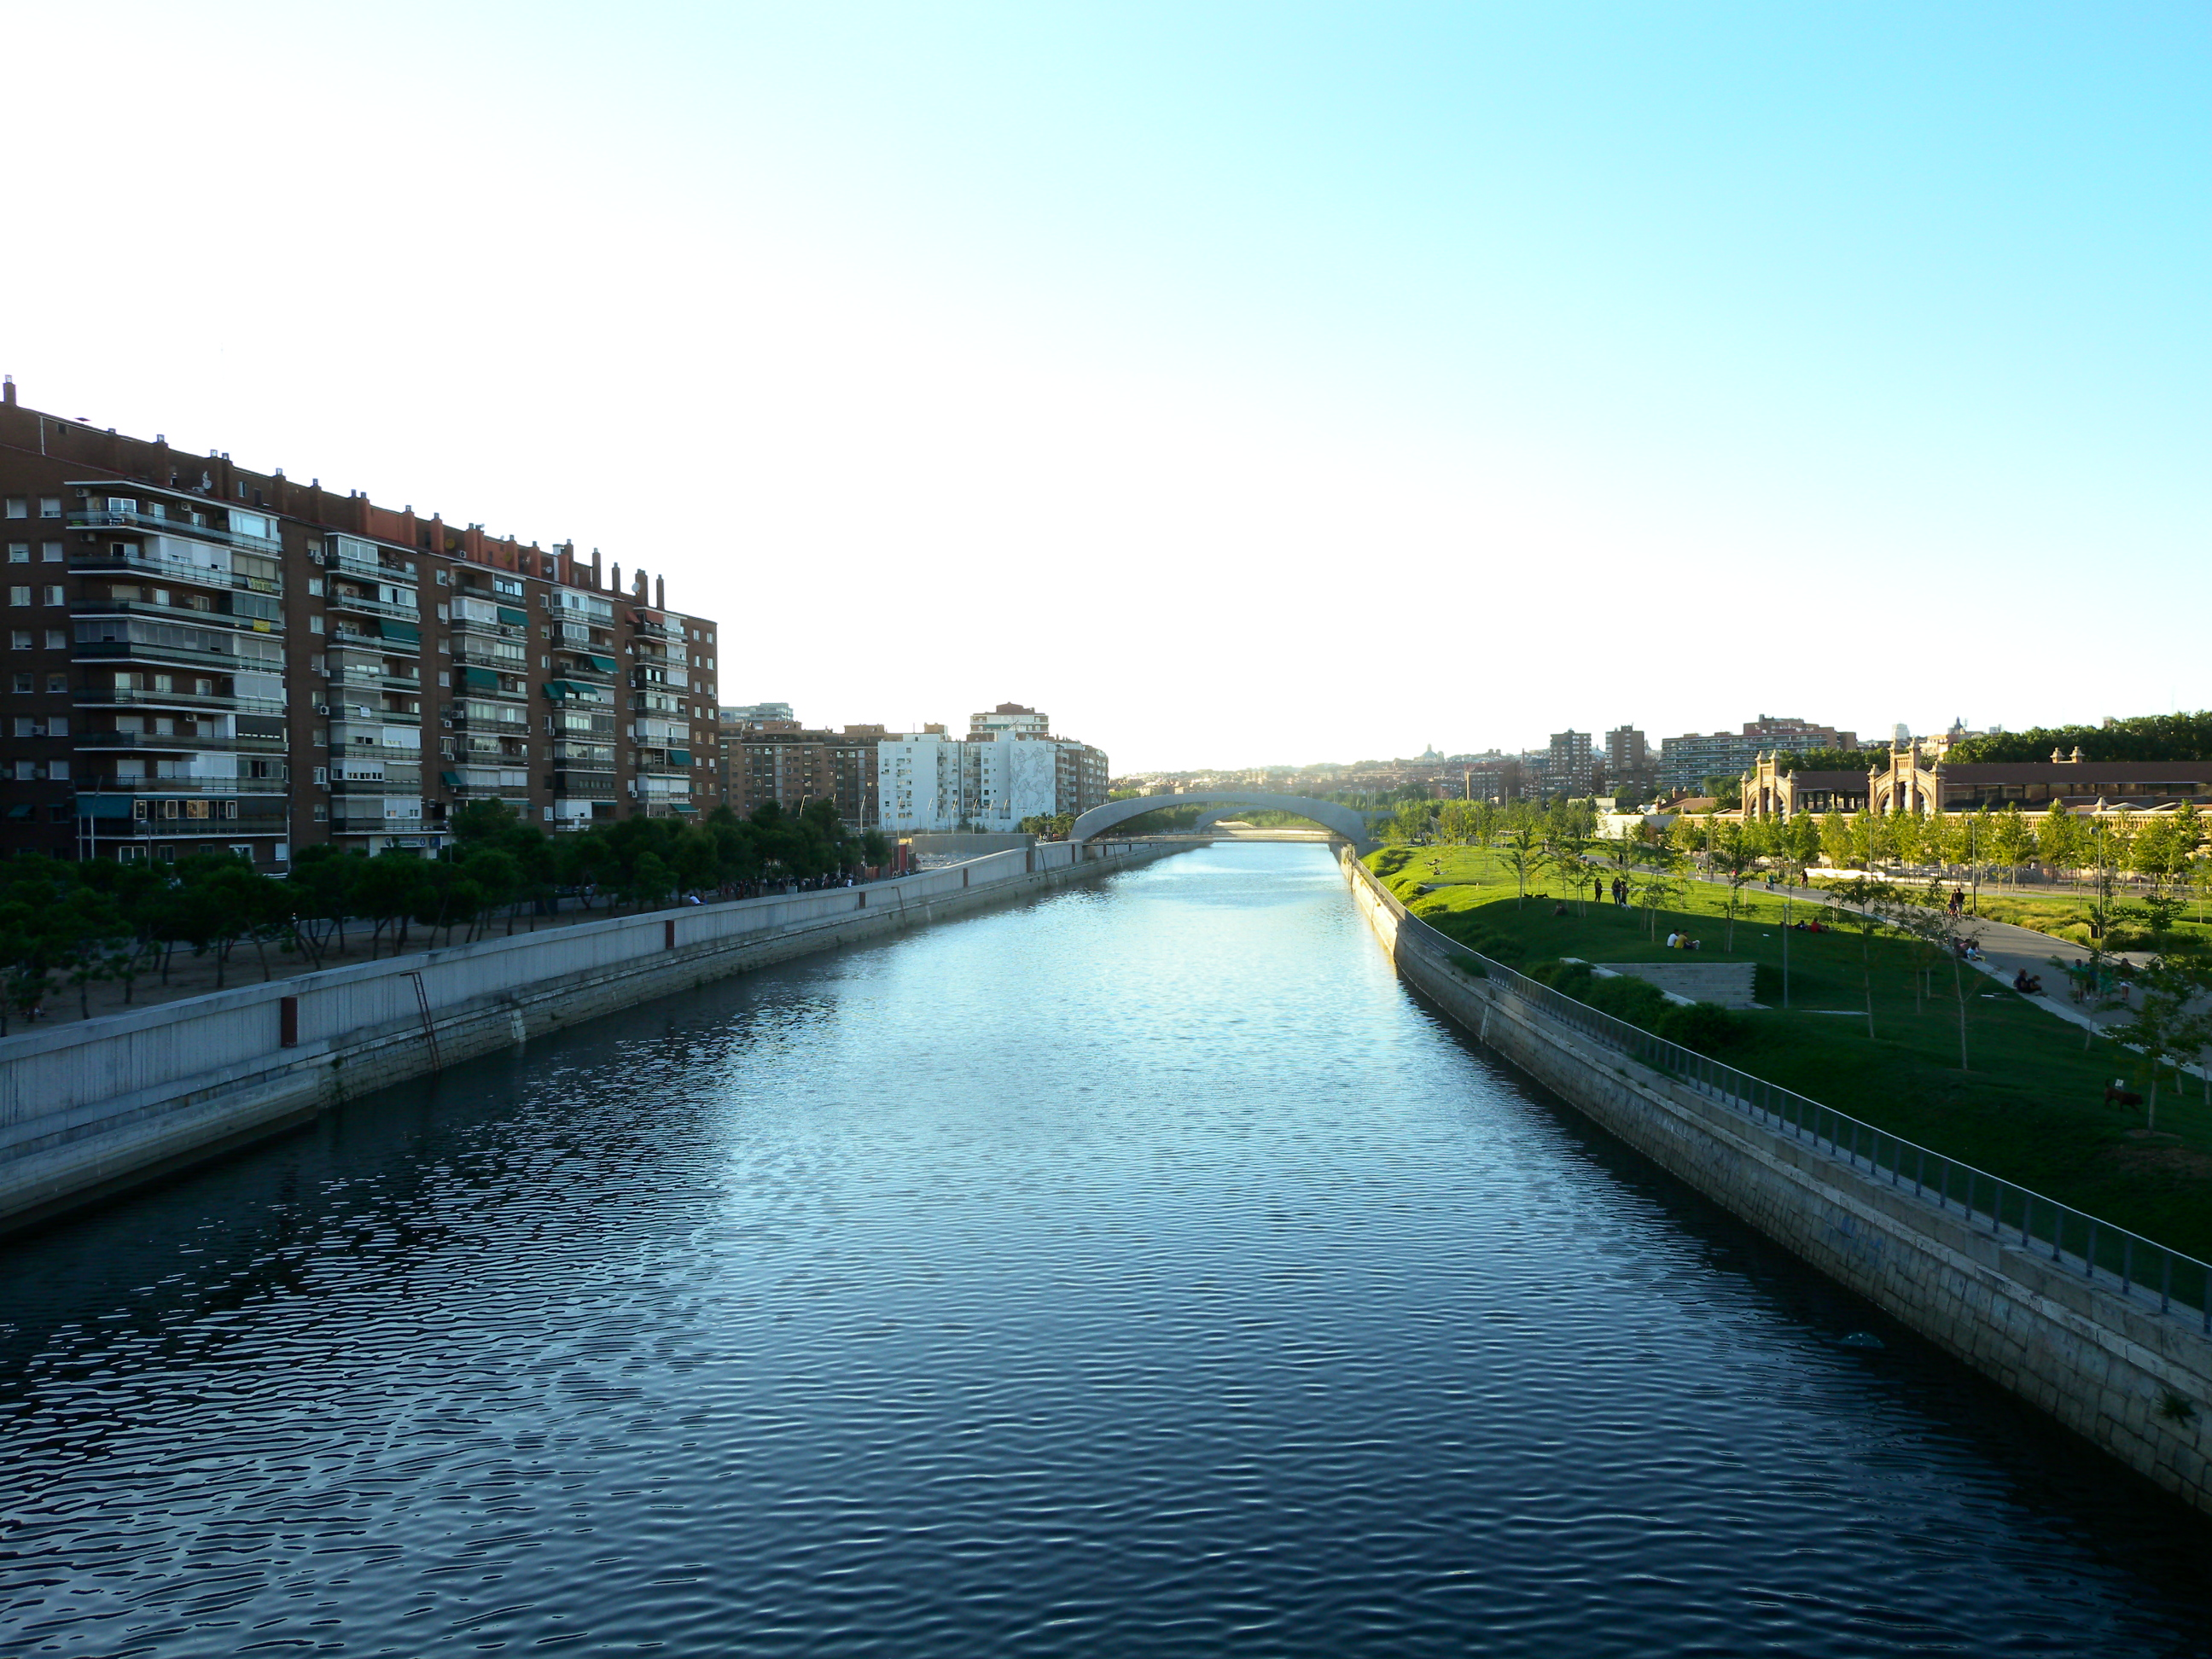 Madrid_-_Río_Manzanares_-_2013-08-08_-_2_Ricardo_Ricote_Rodríguez